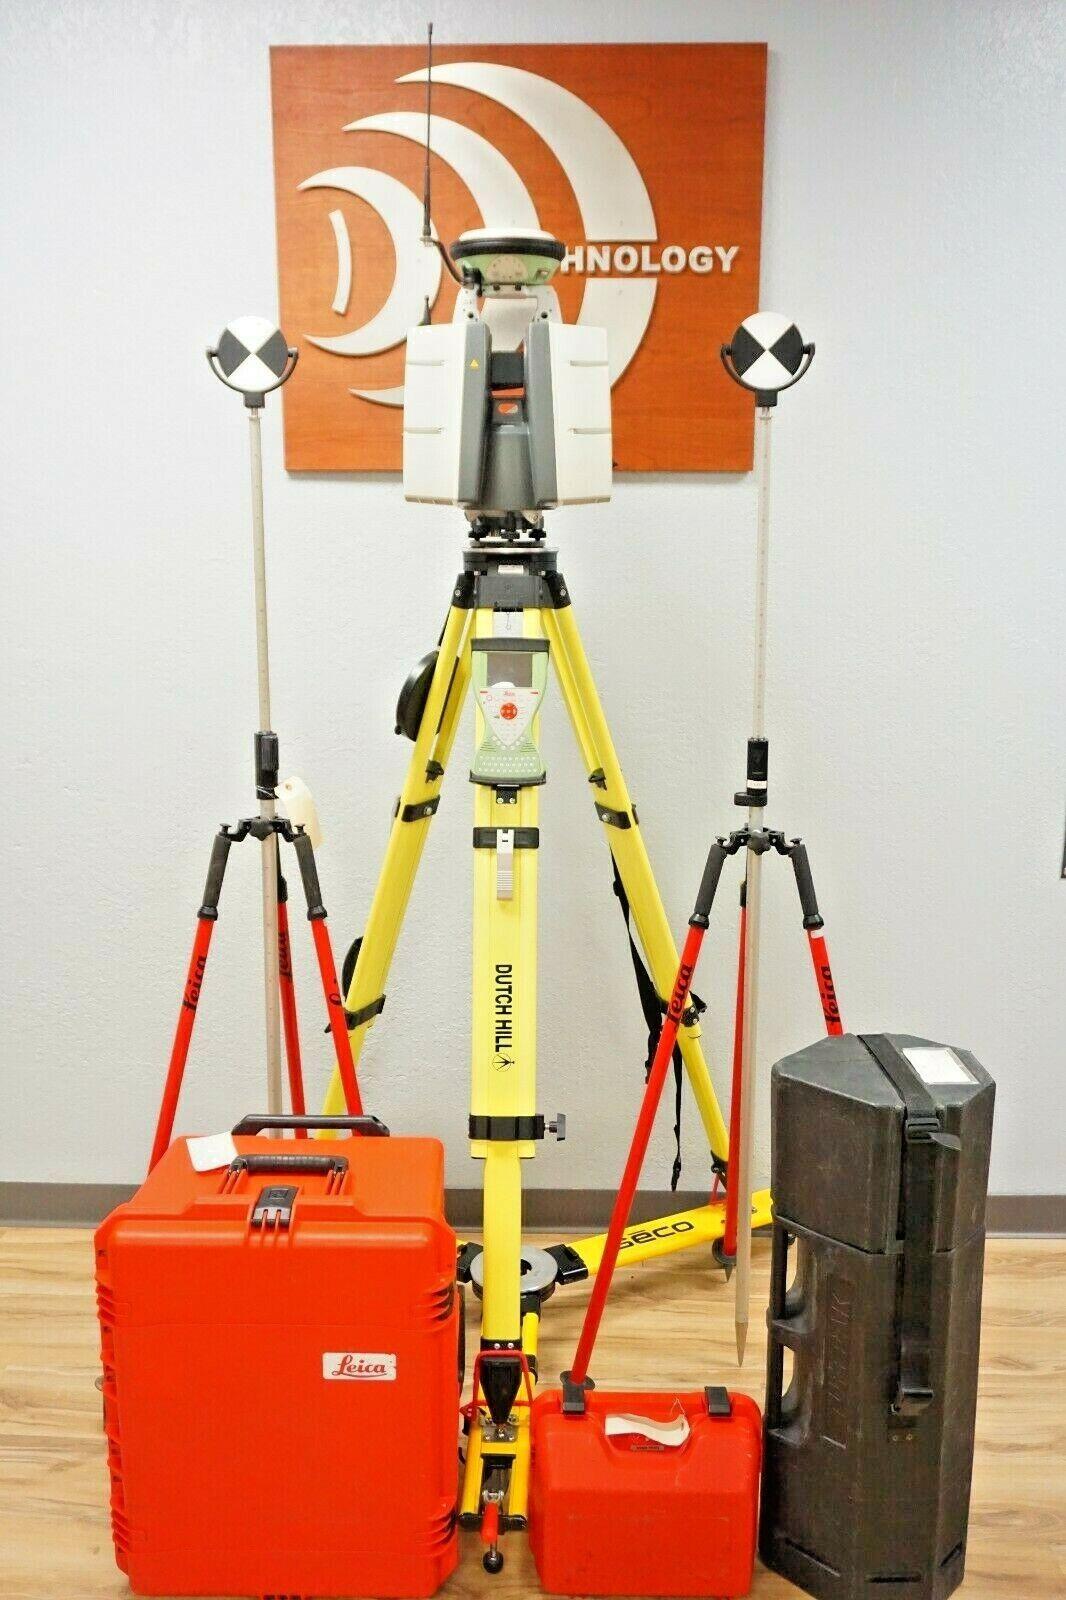 Leica P30 3D High Accuracy Long Range Laser Scanner GS14 CS15 GNSS P40 Faro